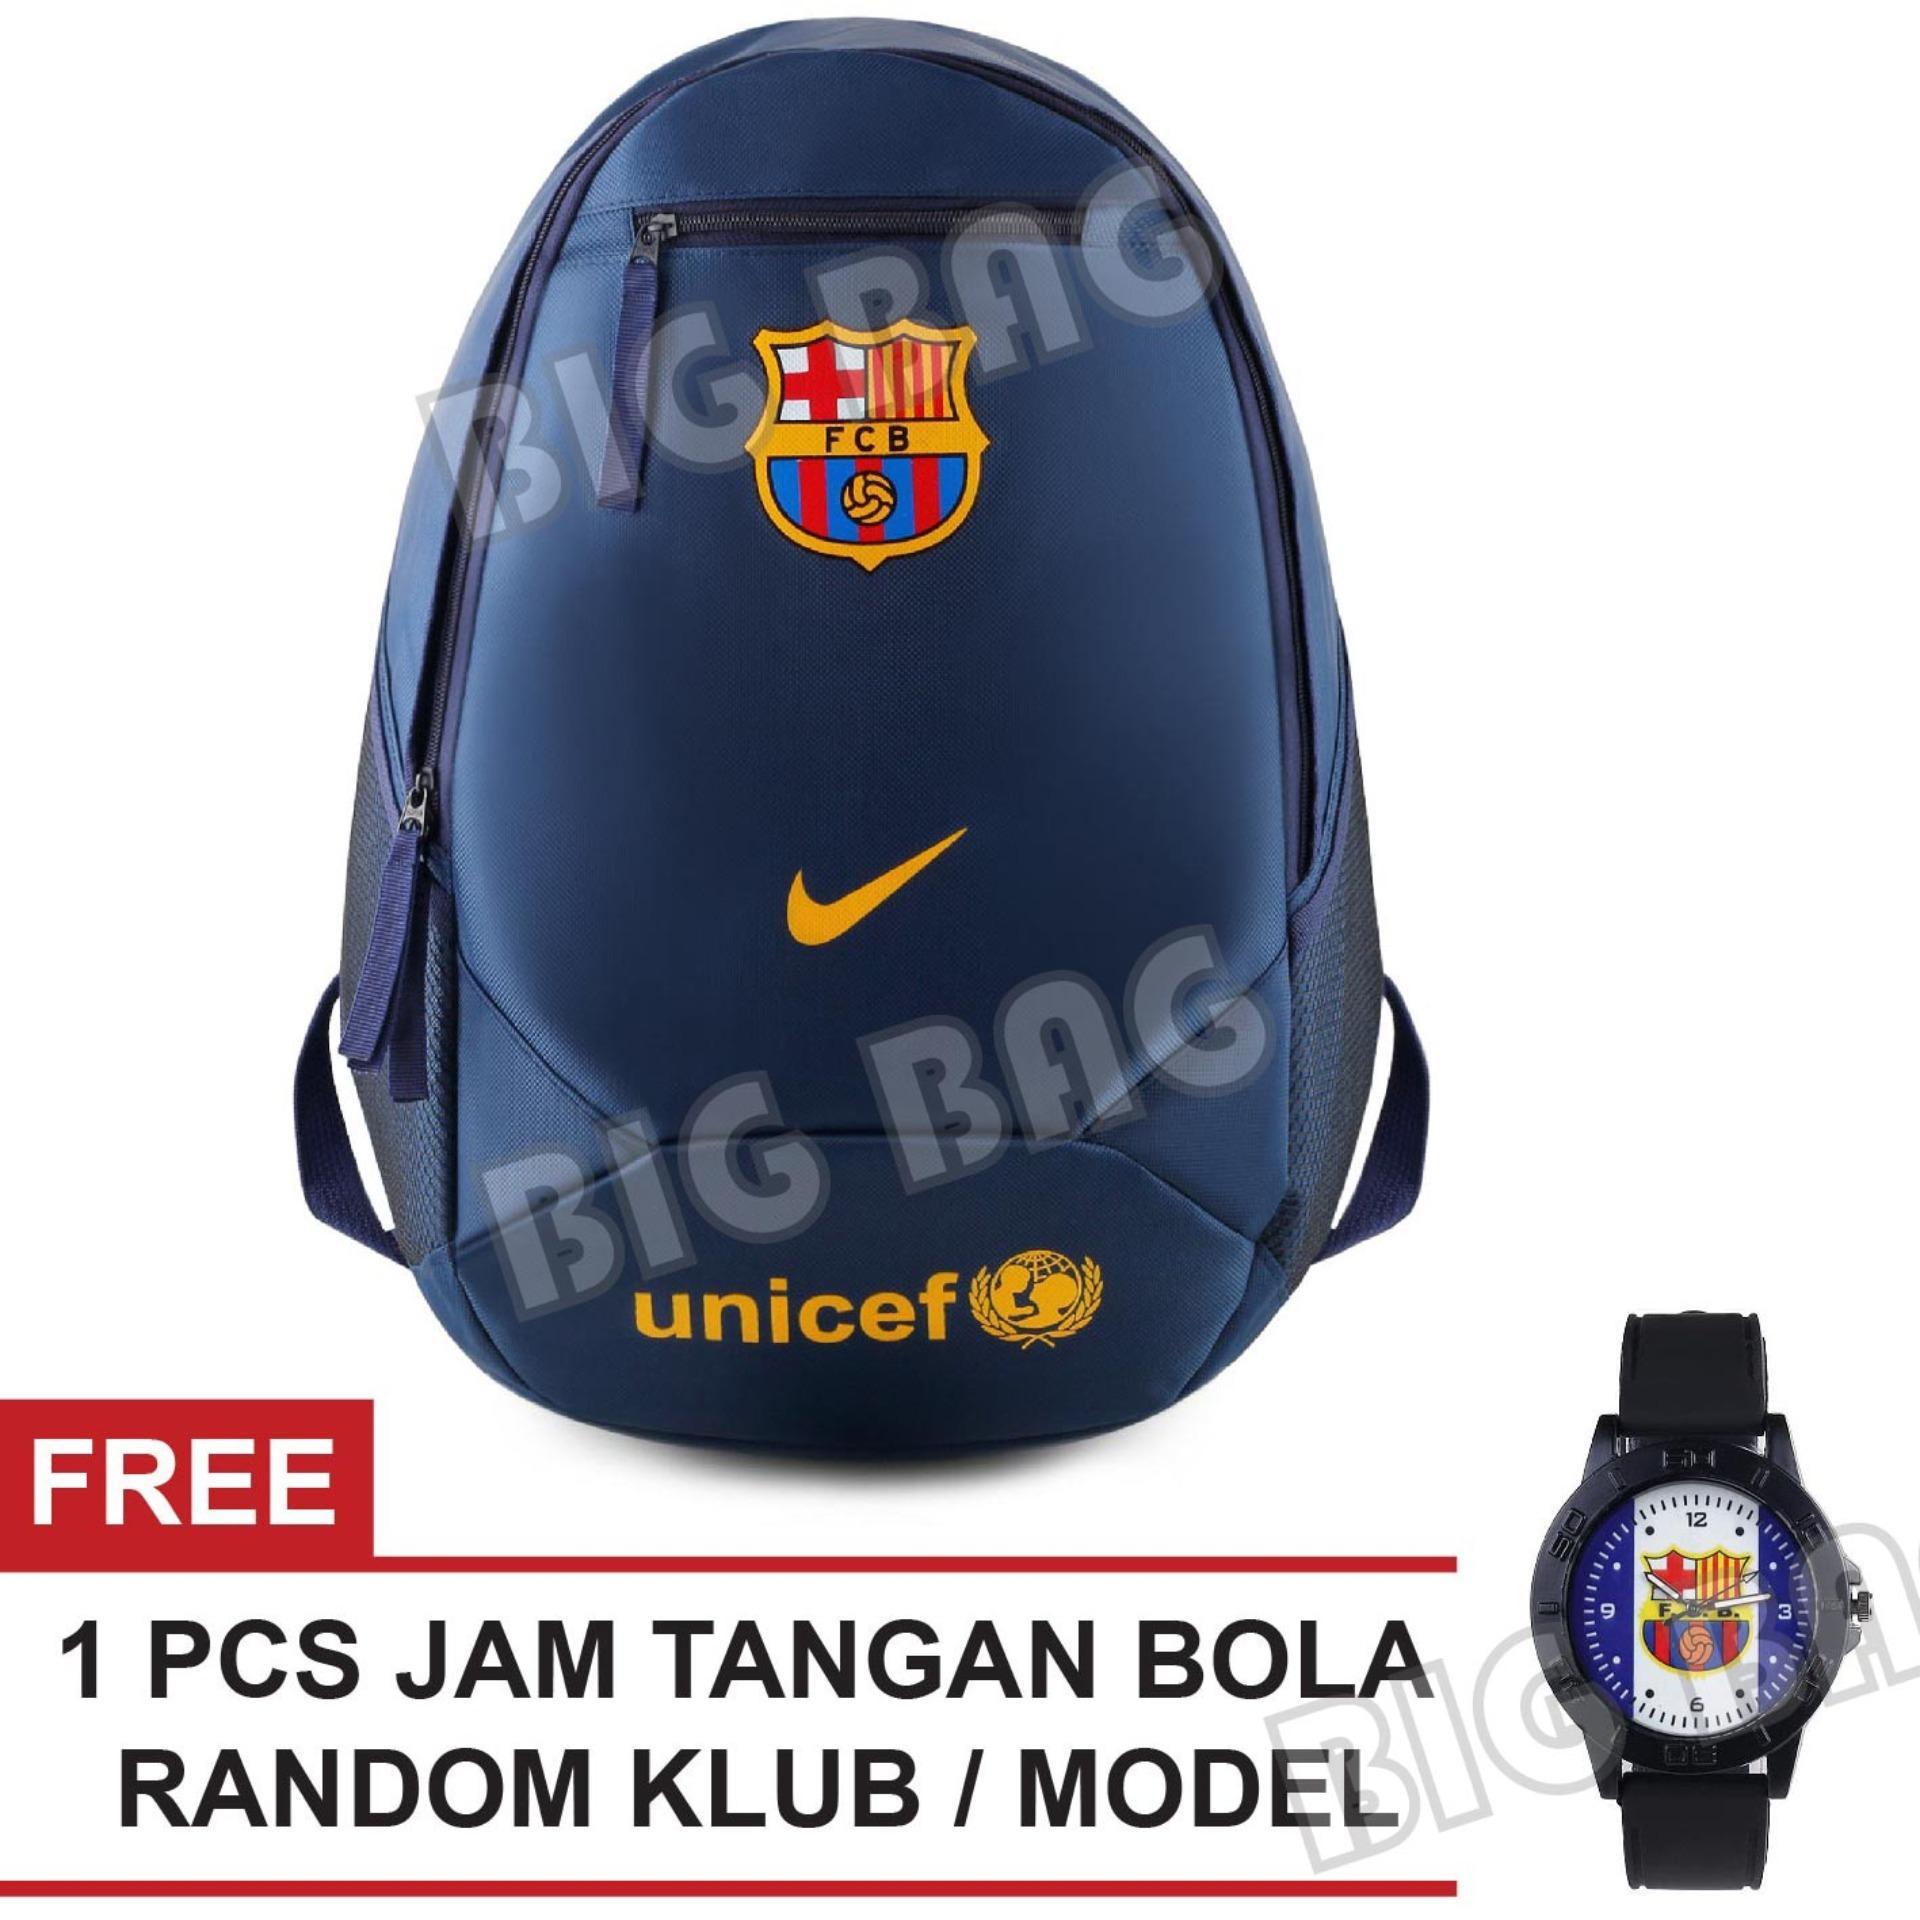 Tas Ransel Nike Bola Pria FC Barcelona - UNICEF Laptop Backpack Men Soccer Editions - Navy + Raincover + FREE Jam Tangan Pria Random Color / Model